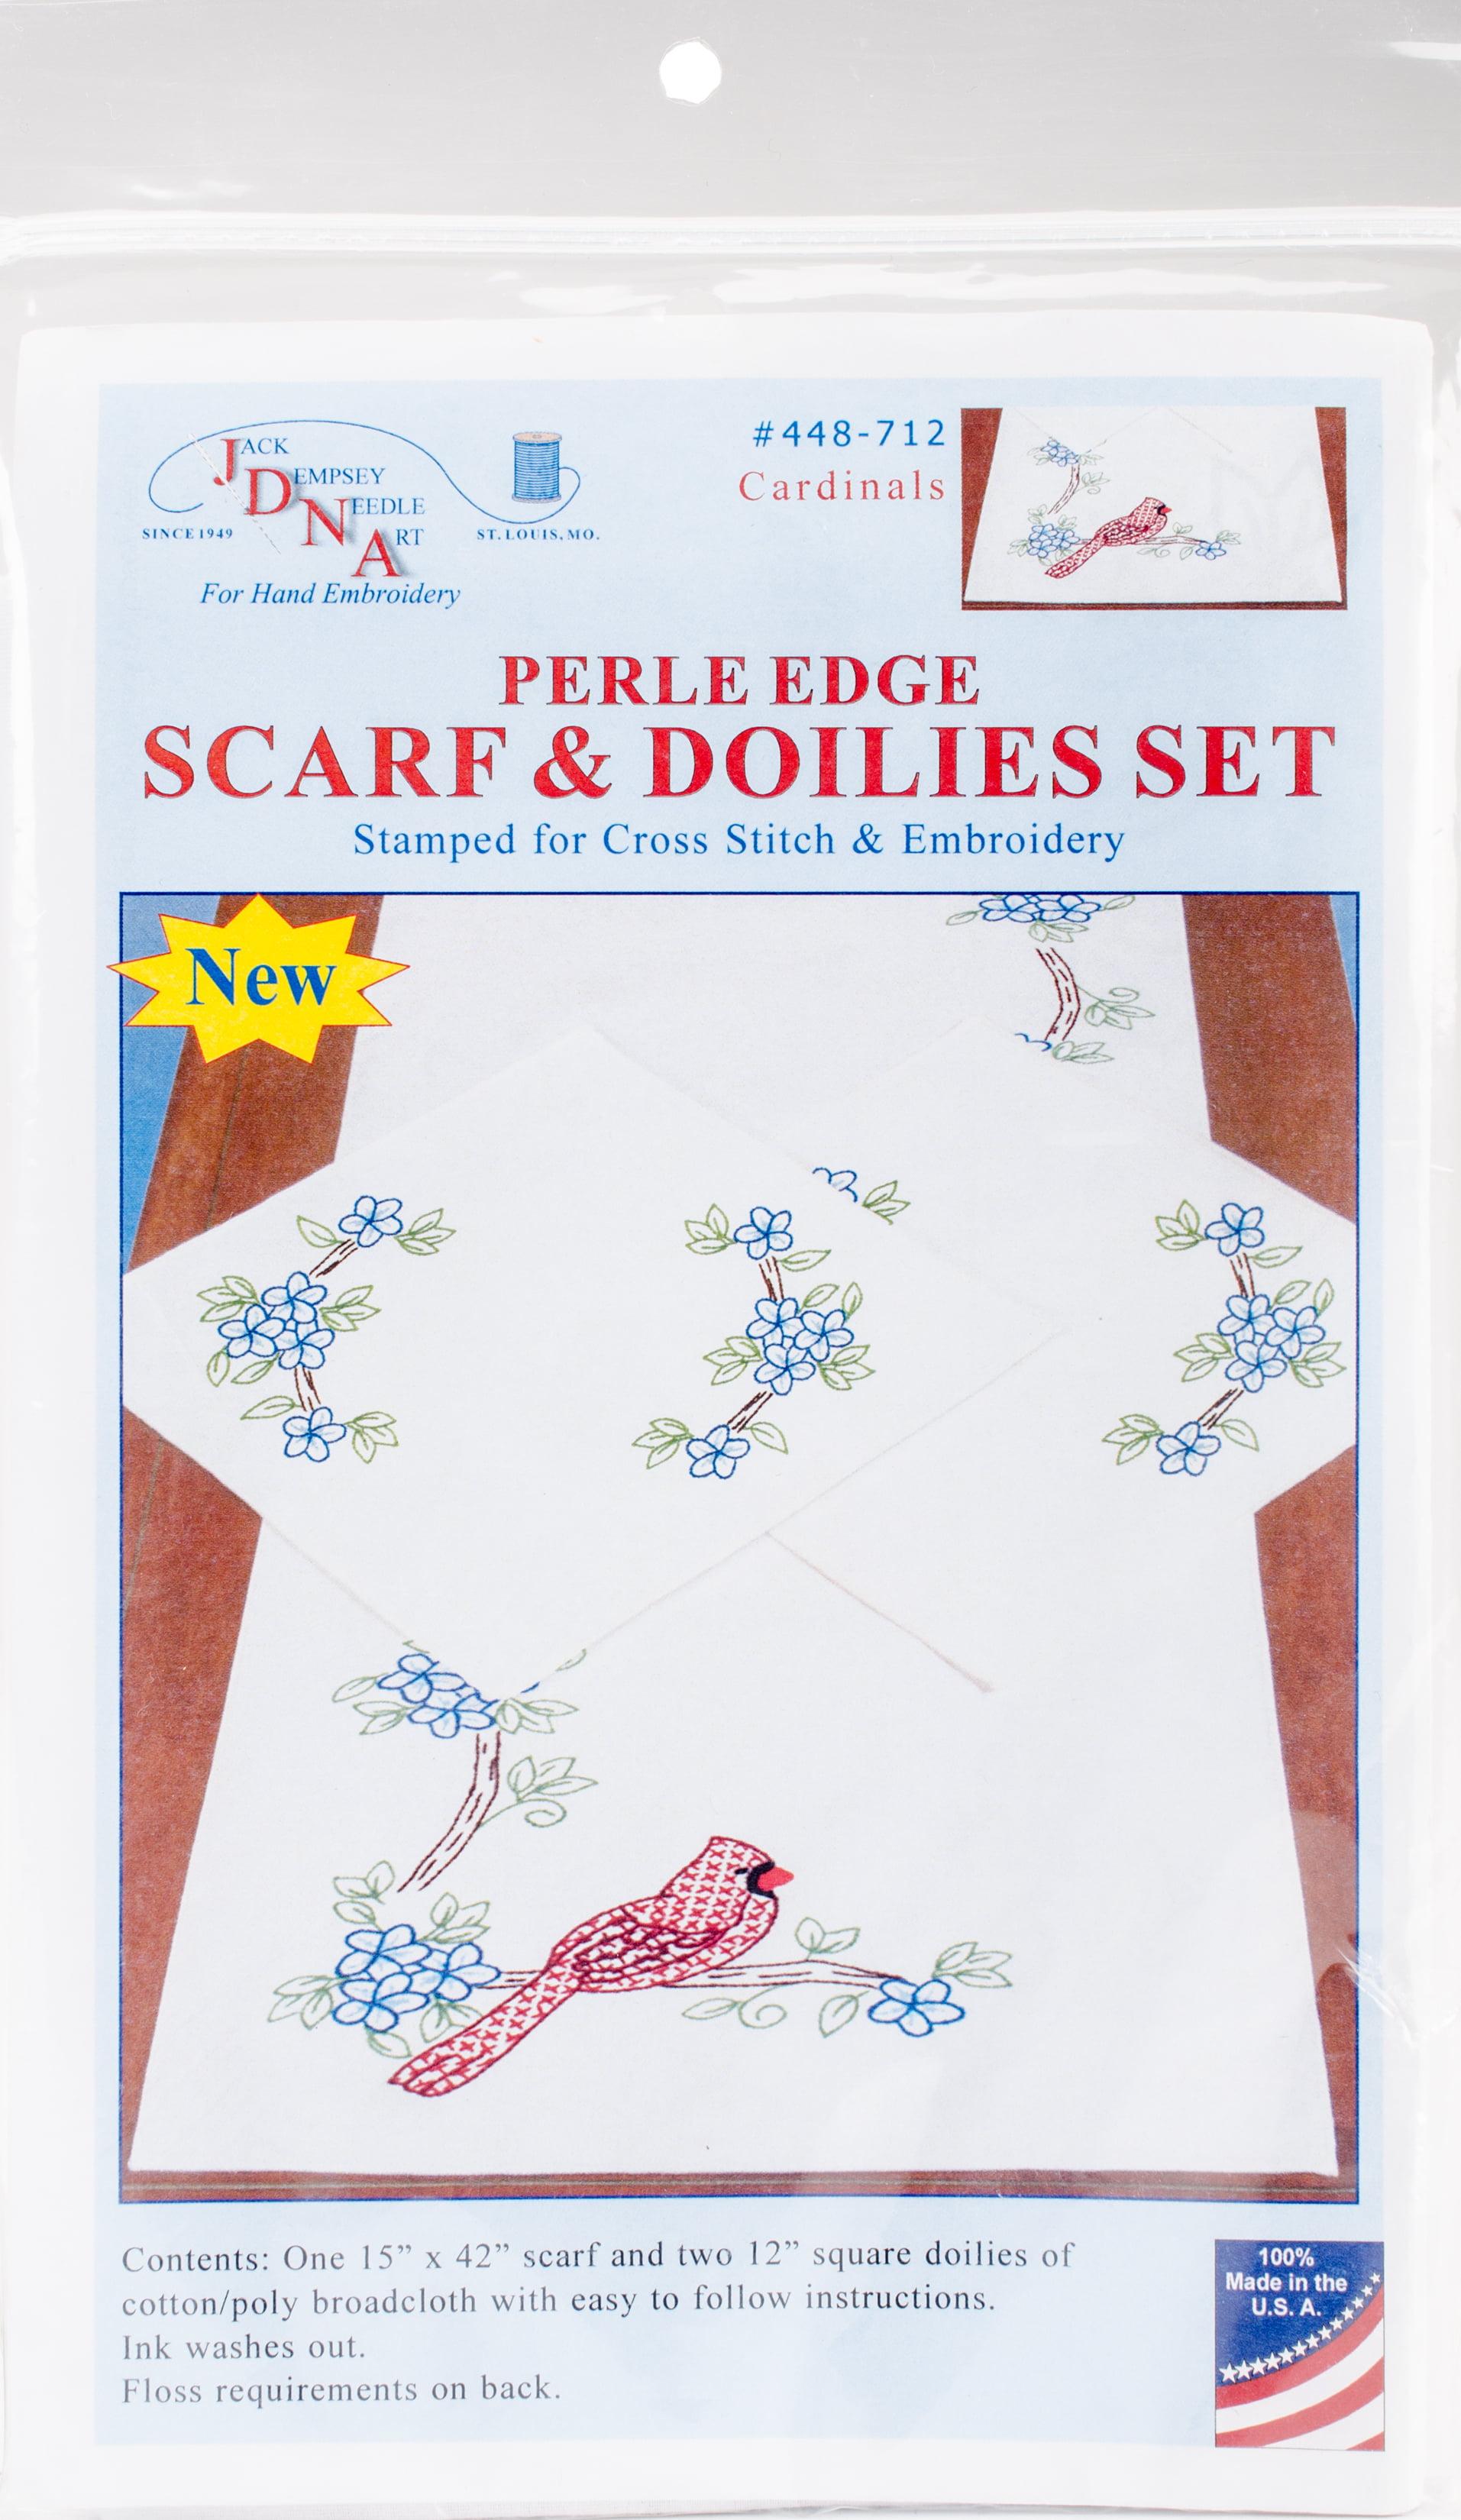 Jack Dempsey Stamped Dresser Scarf /& Doilies Perle Edge-cardinals